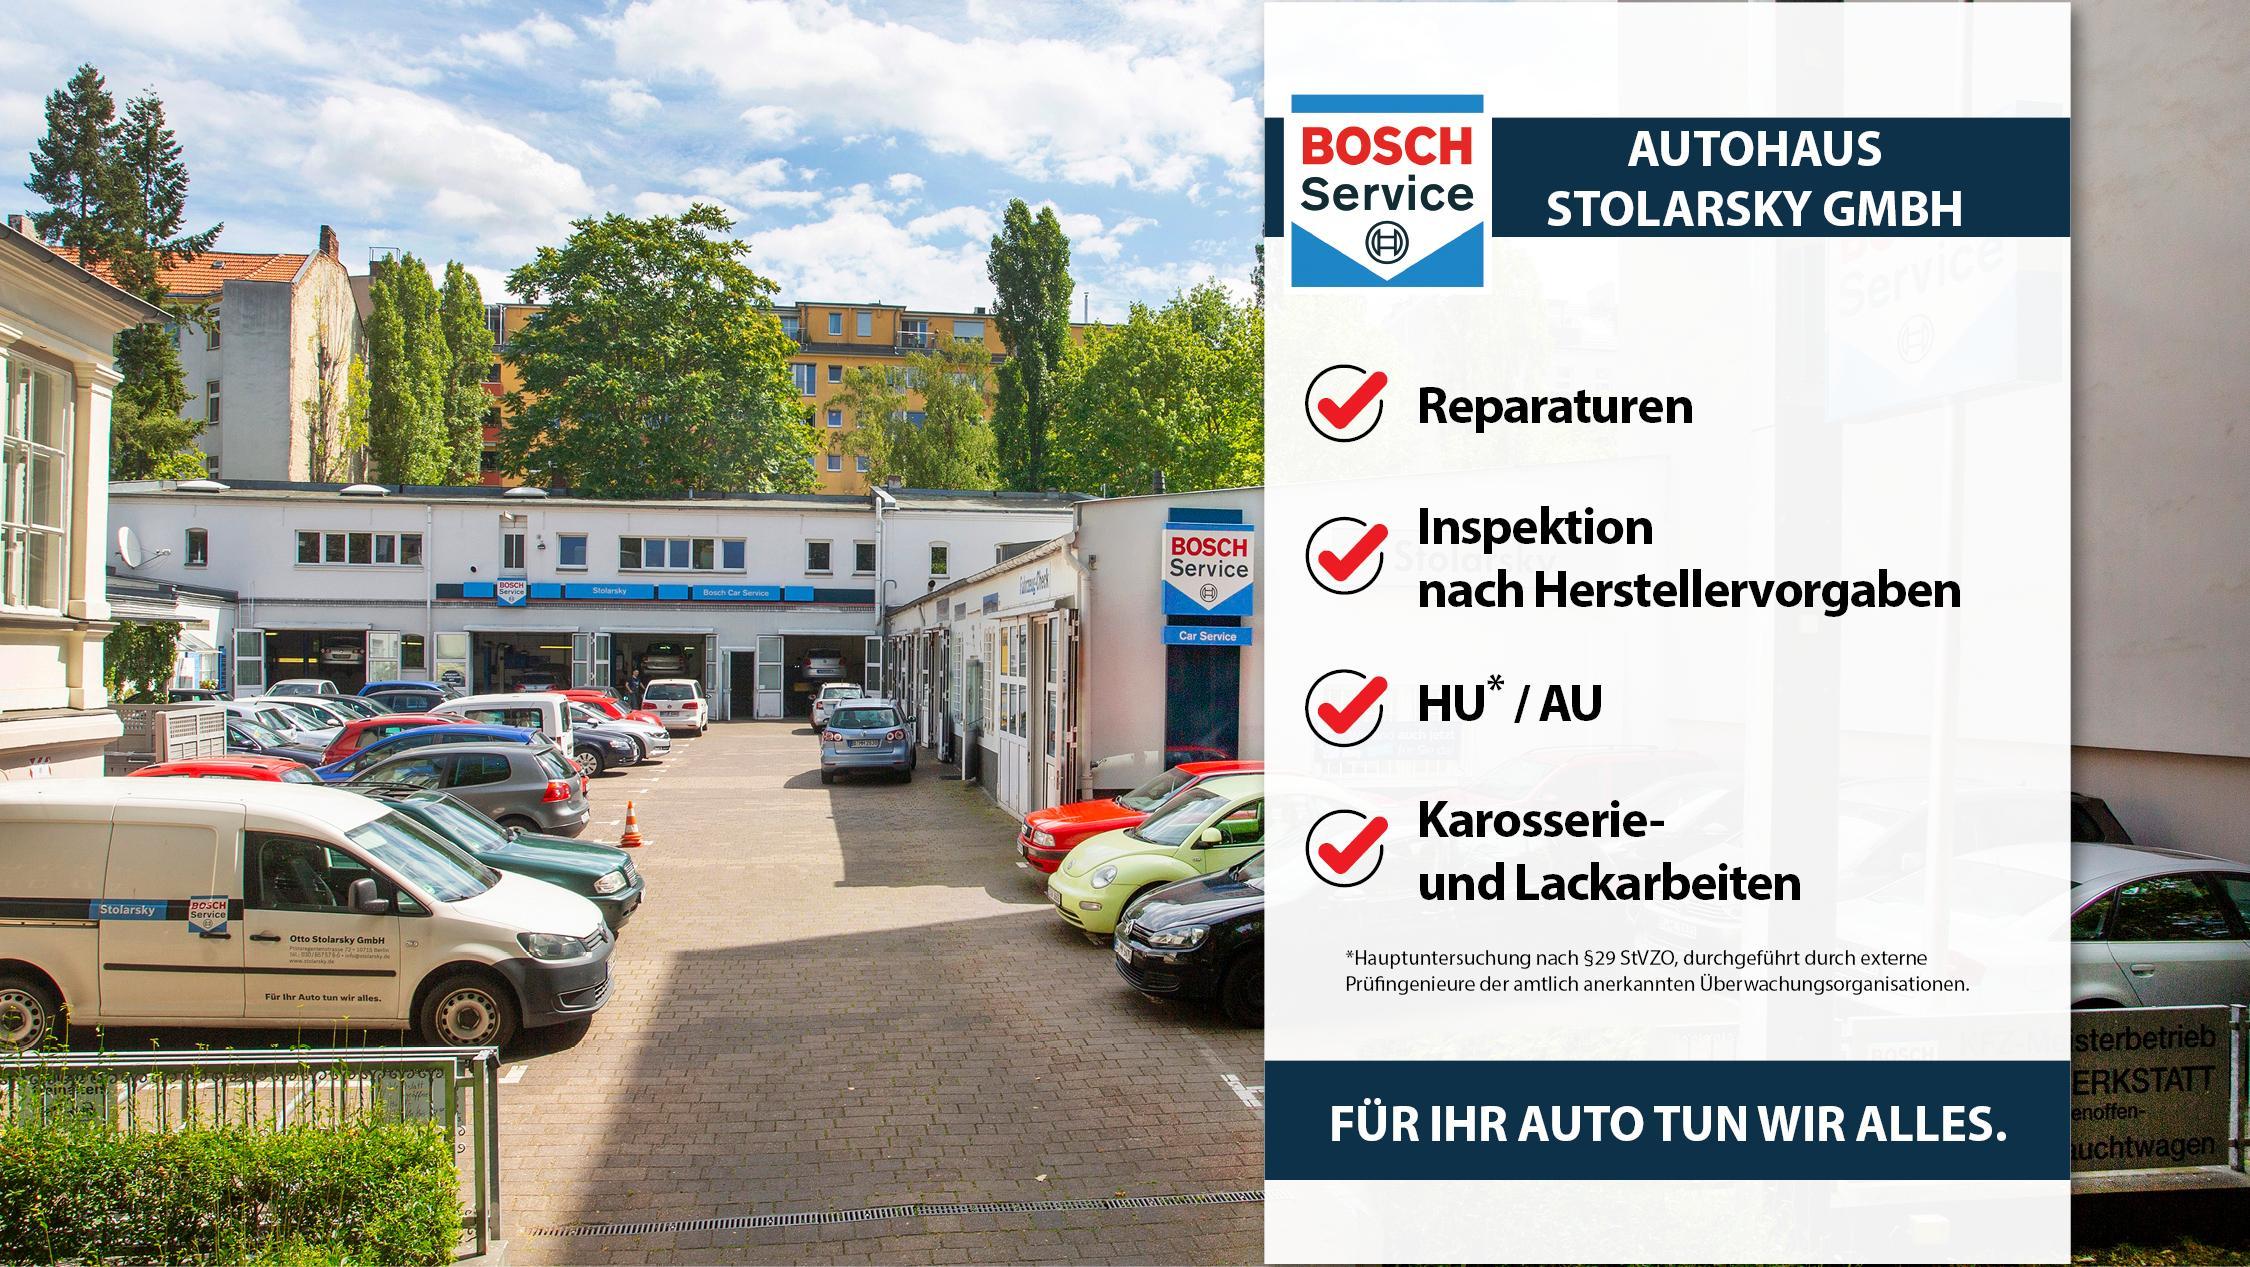 Autohaus Stolarsky GmbH, Prinzregentenstraße in Berlin